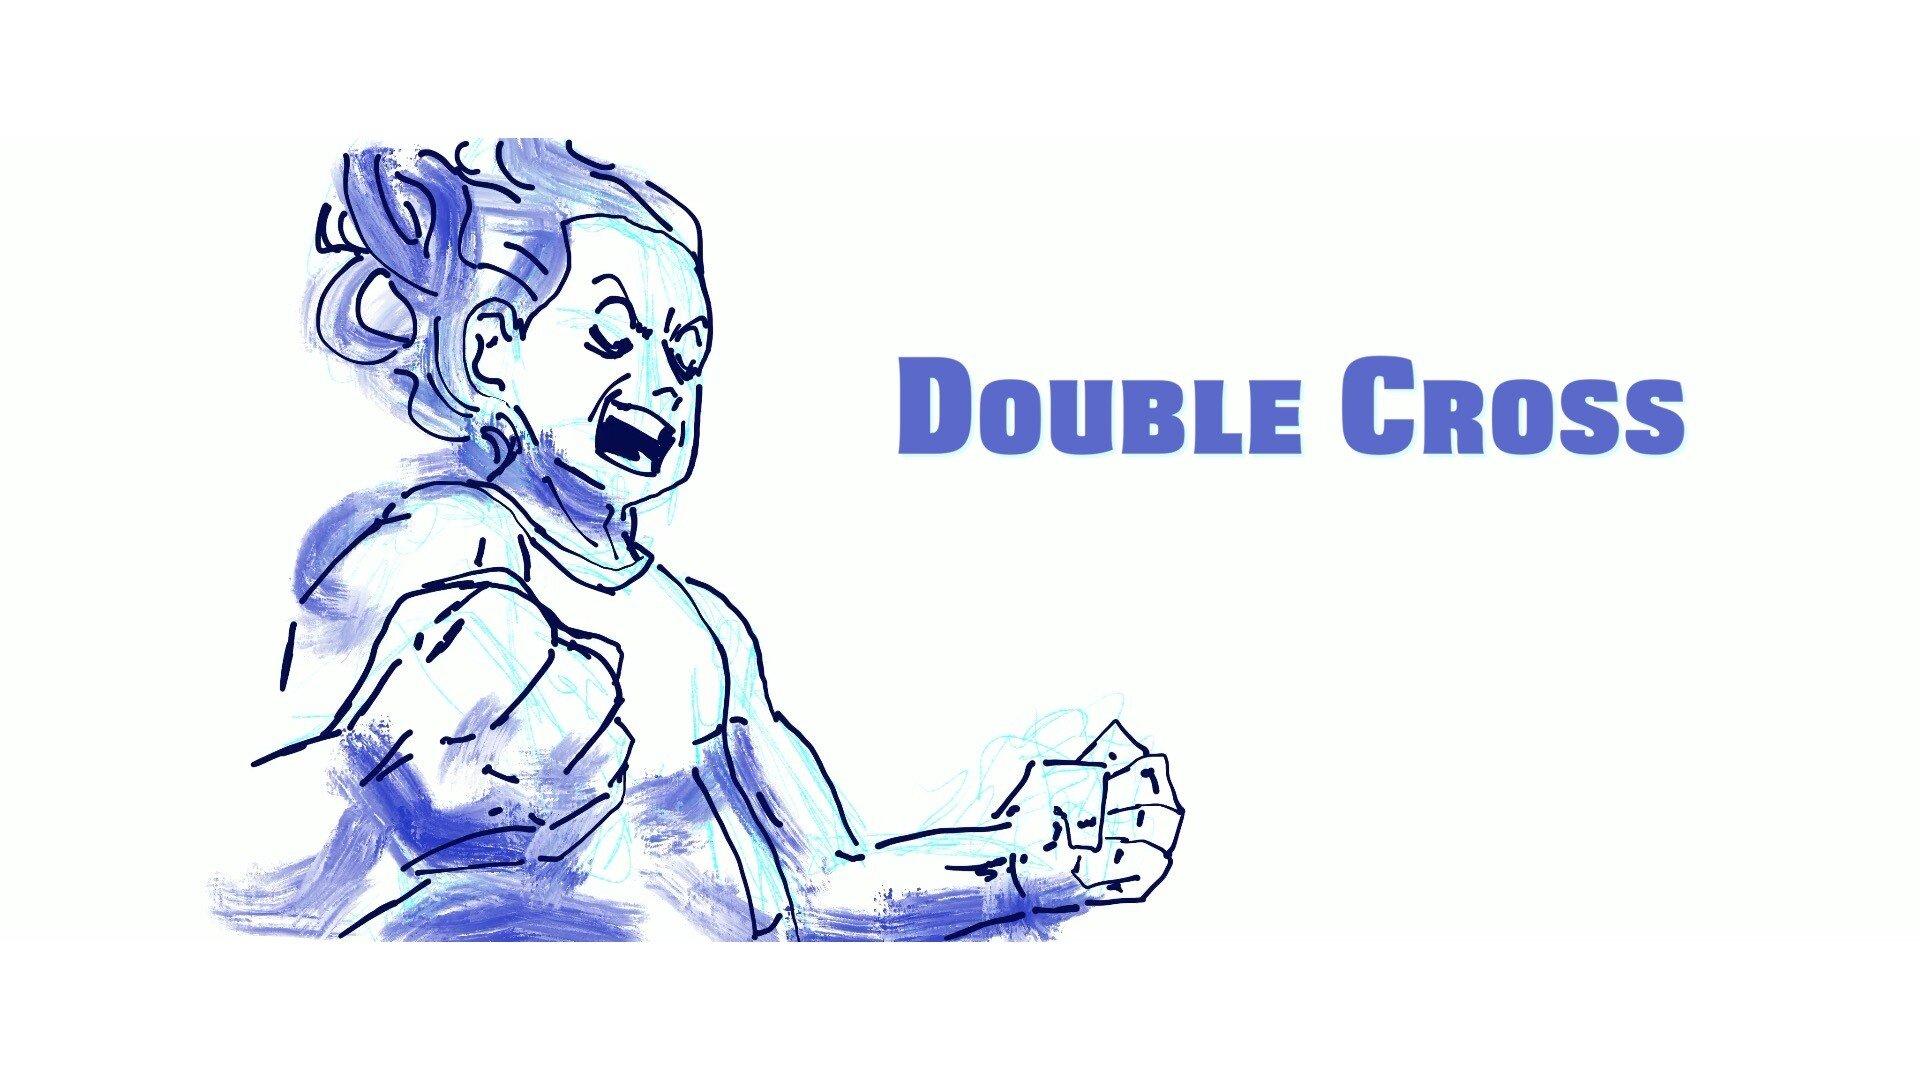 Double_Cross_Still.jpg